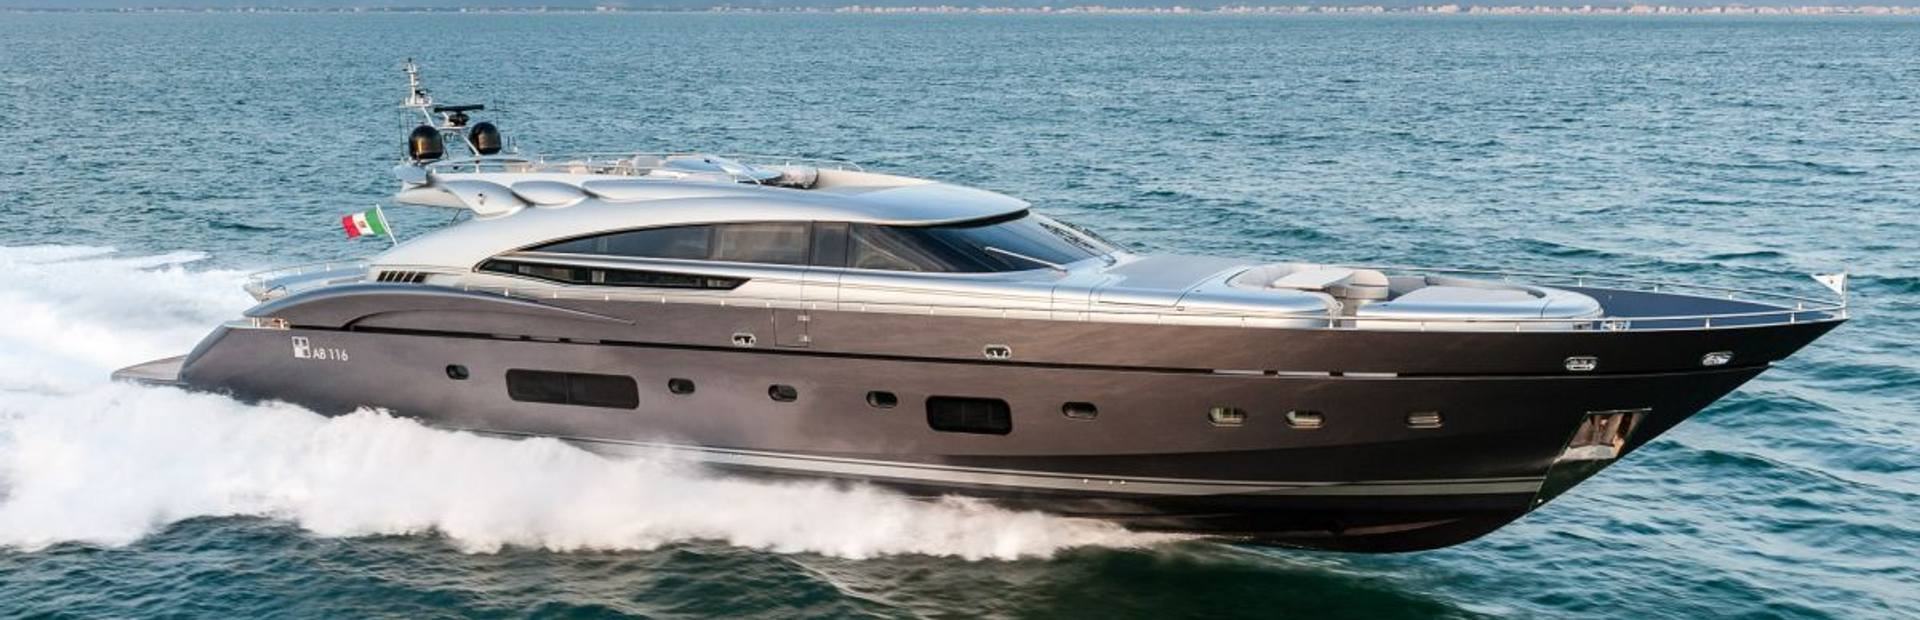 AB Yachts AB 116 Yacht Charter